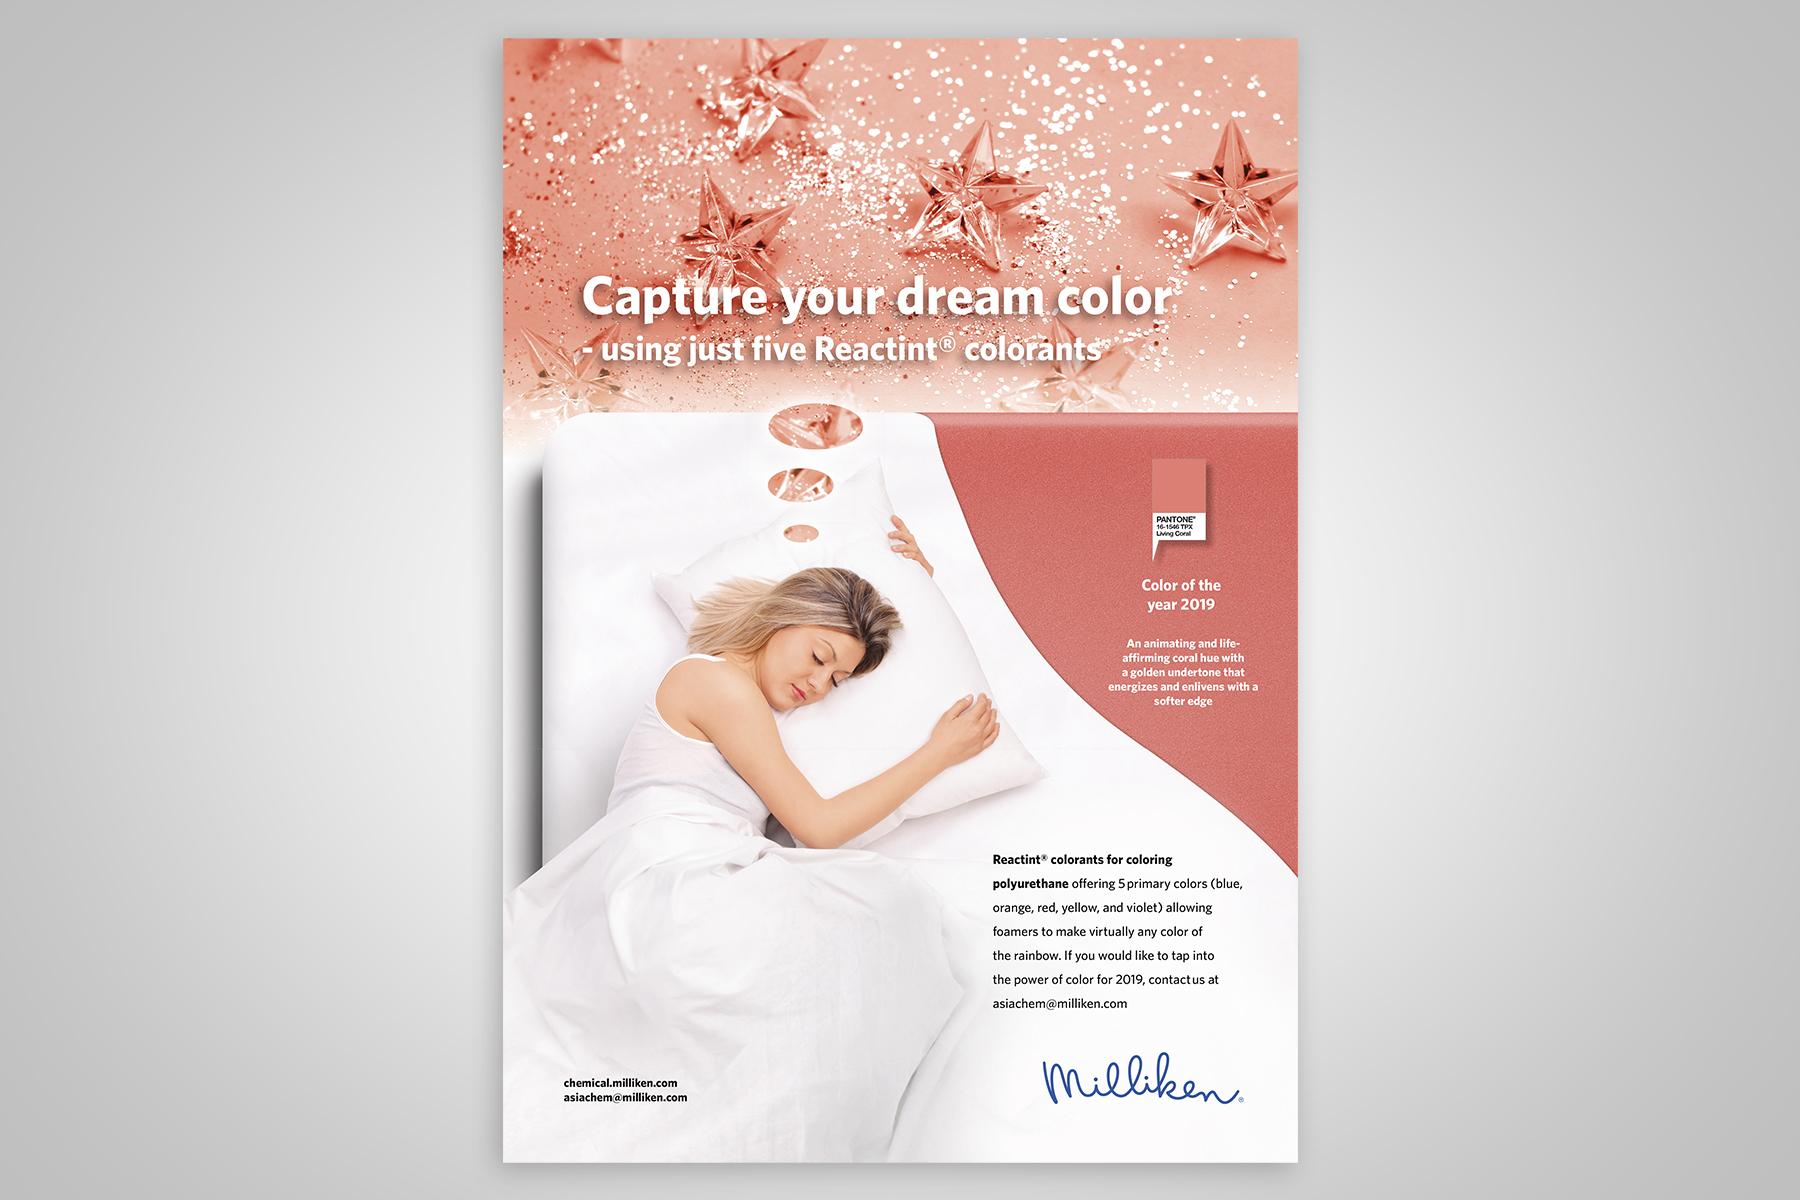 Centigrade - Milliken Pantone Advert